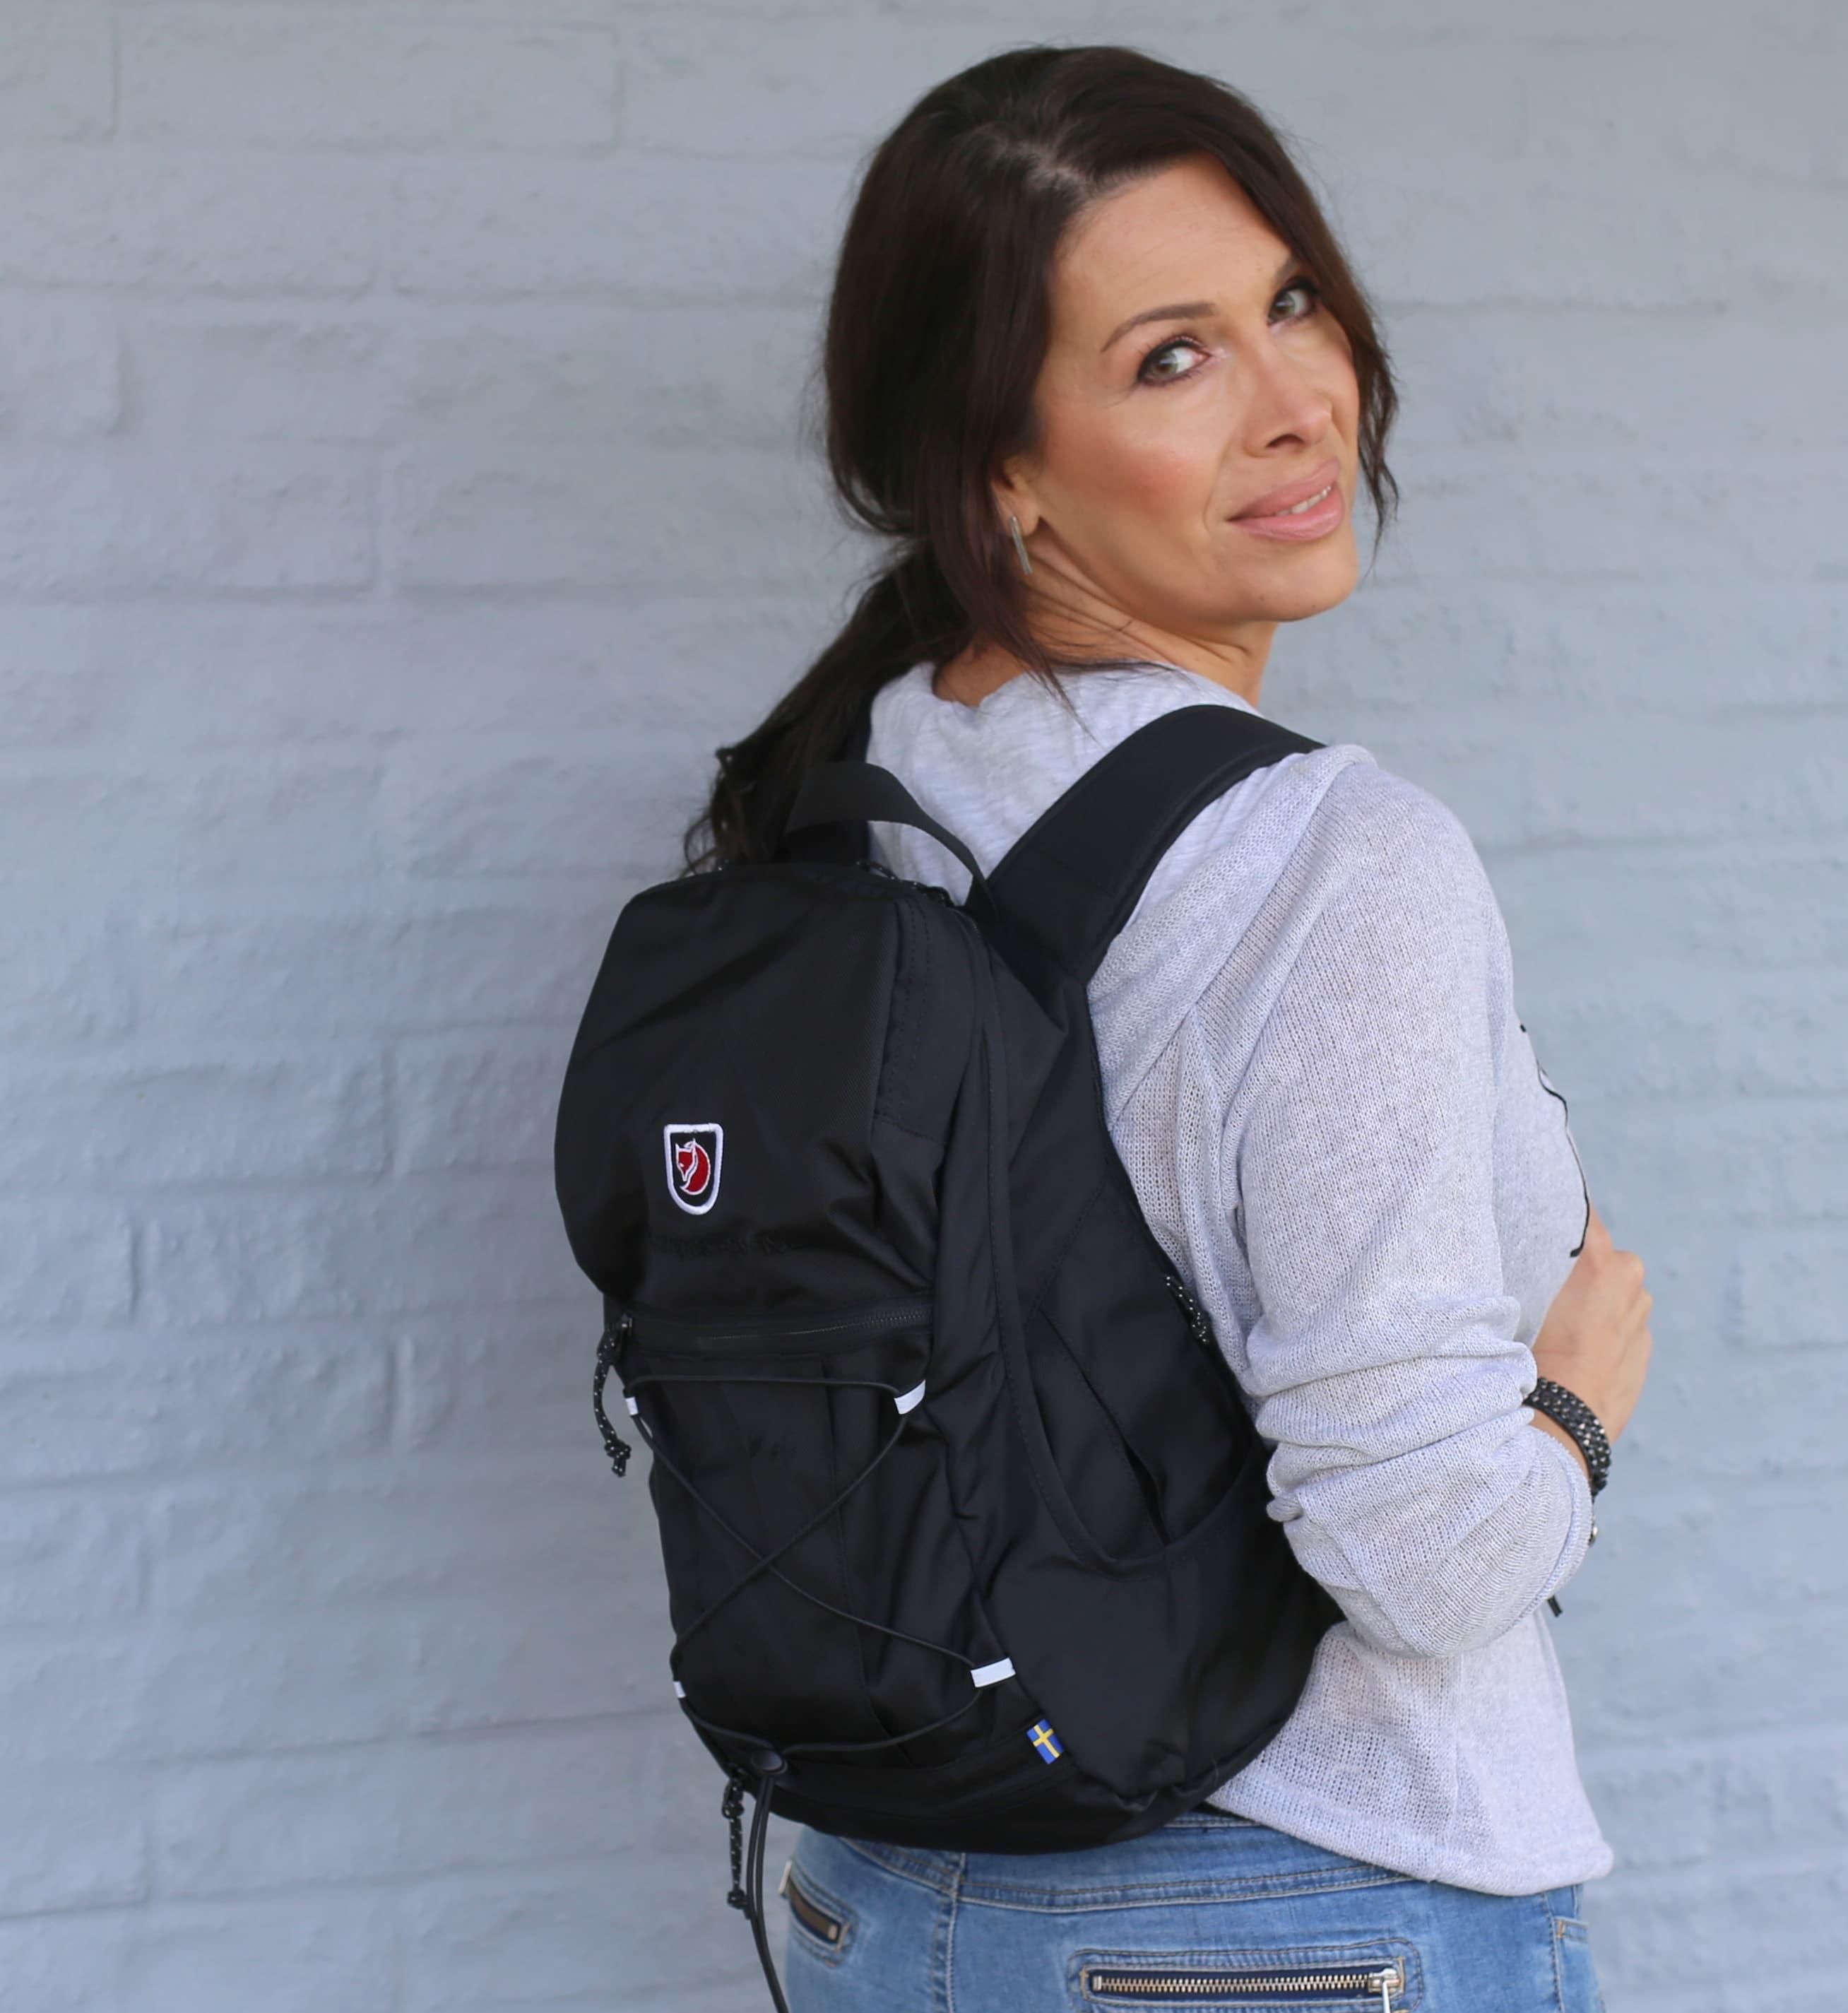 rygsæk på ryggen foran